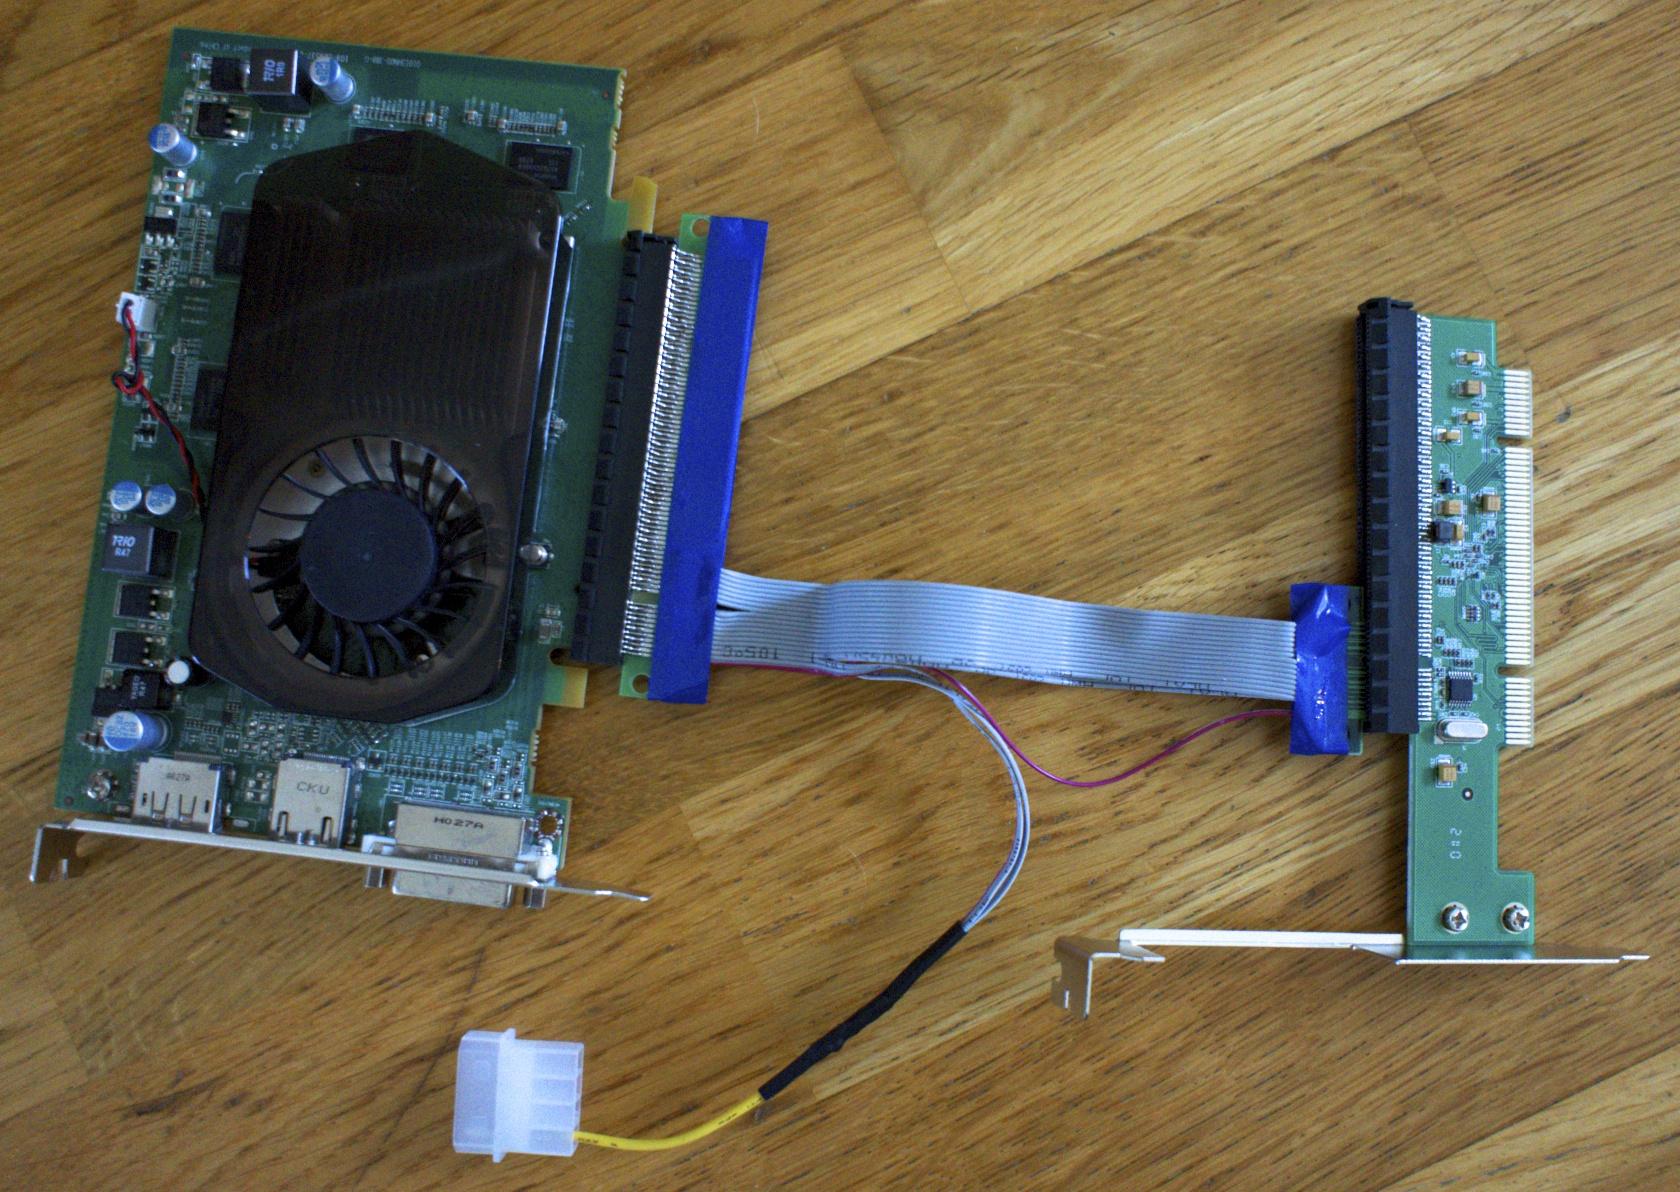 Radeon 5570 i PCIe forlenger og PCI adapter